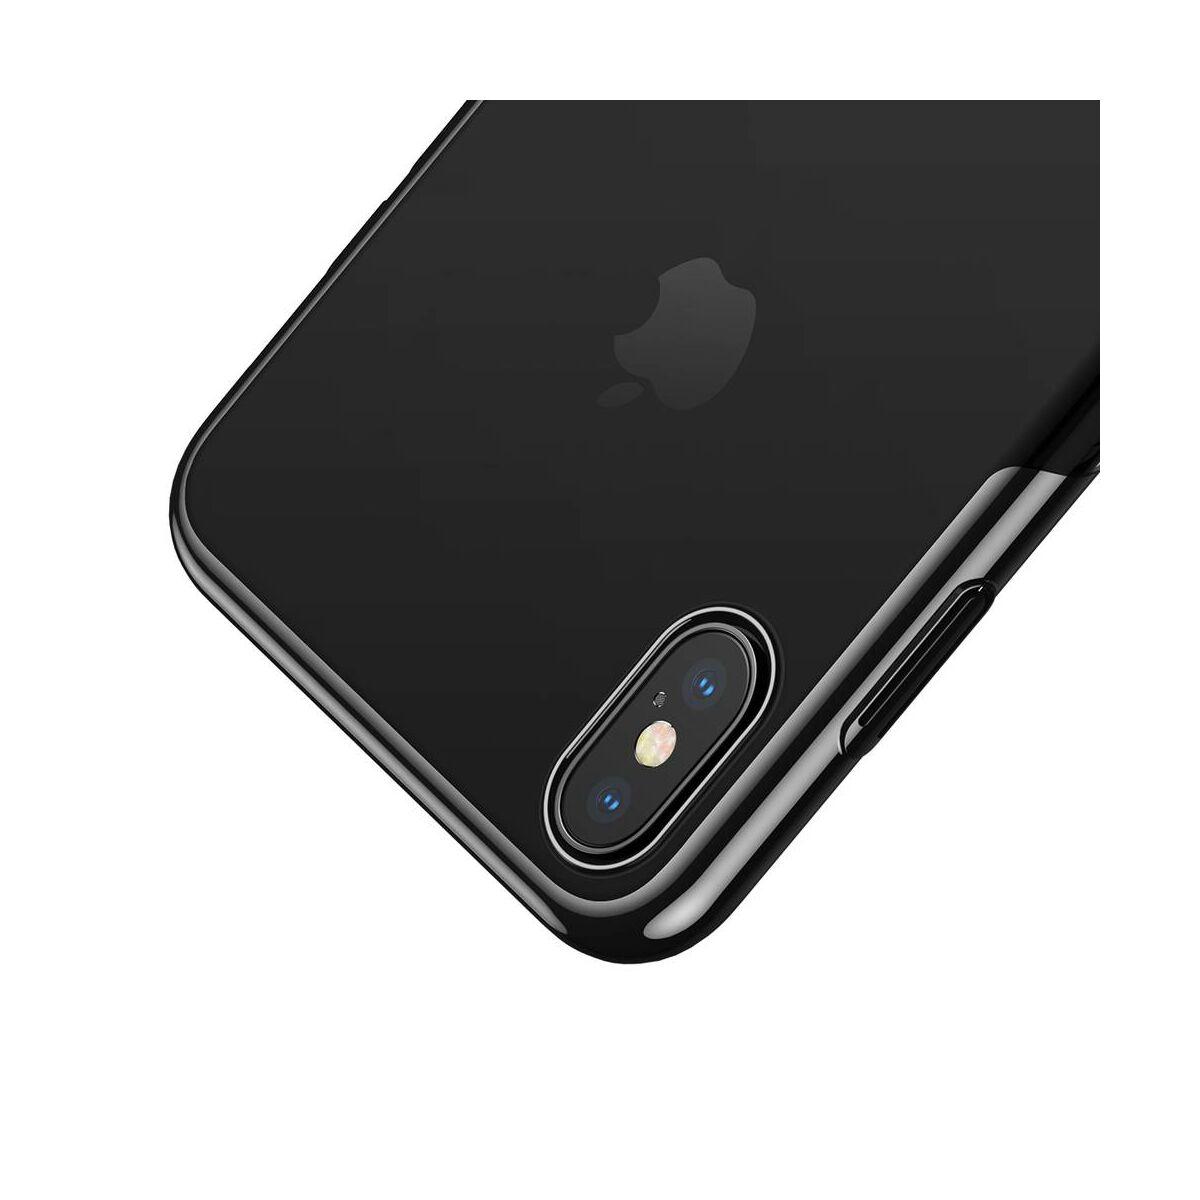 Baseus iPhone XS Max tok, Glitter, fekete (WIAPIPH65-DW01)